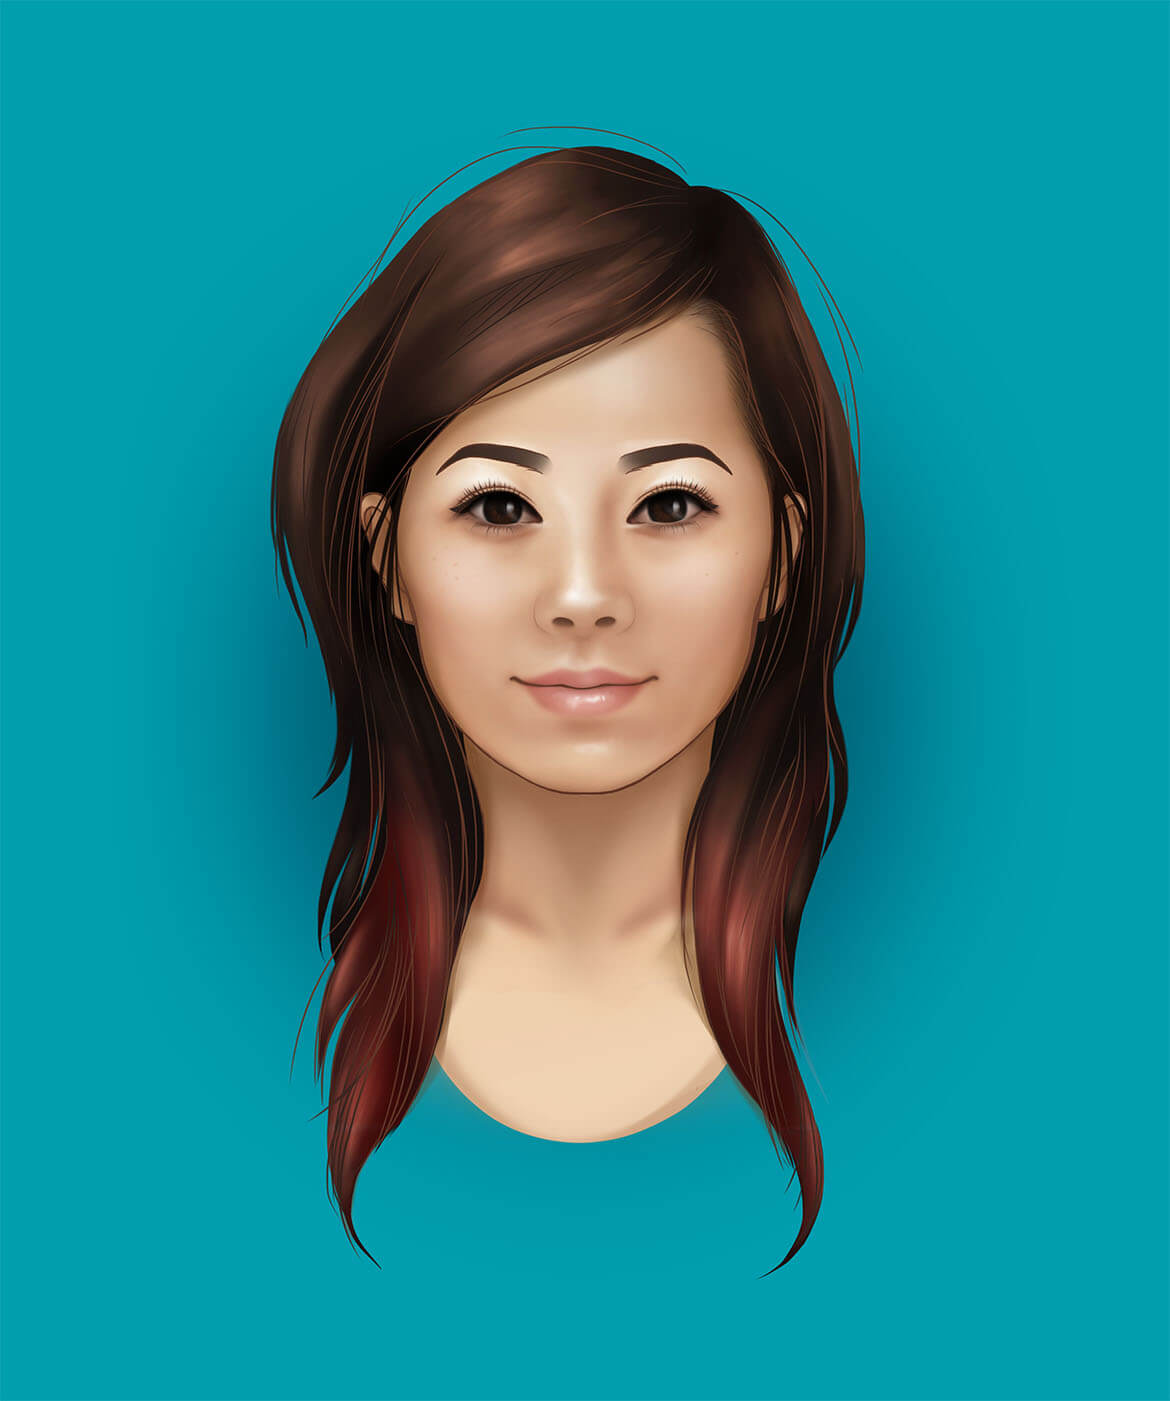 sheila shu self portrait drawn in Photoshop